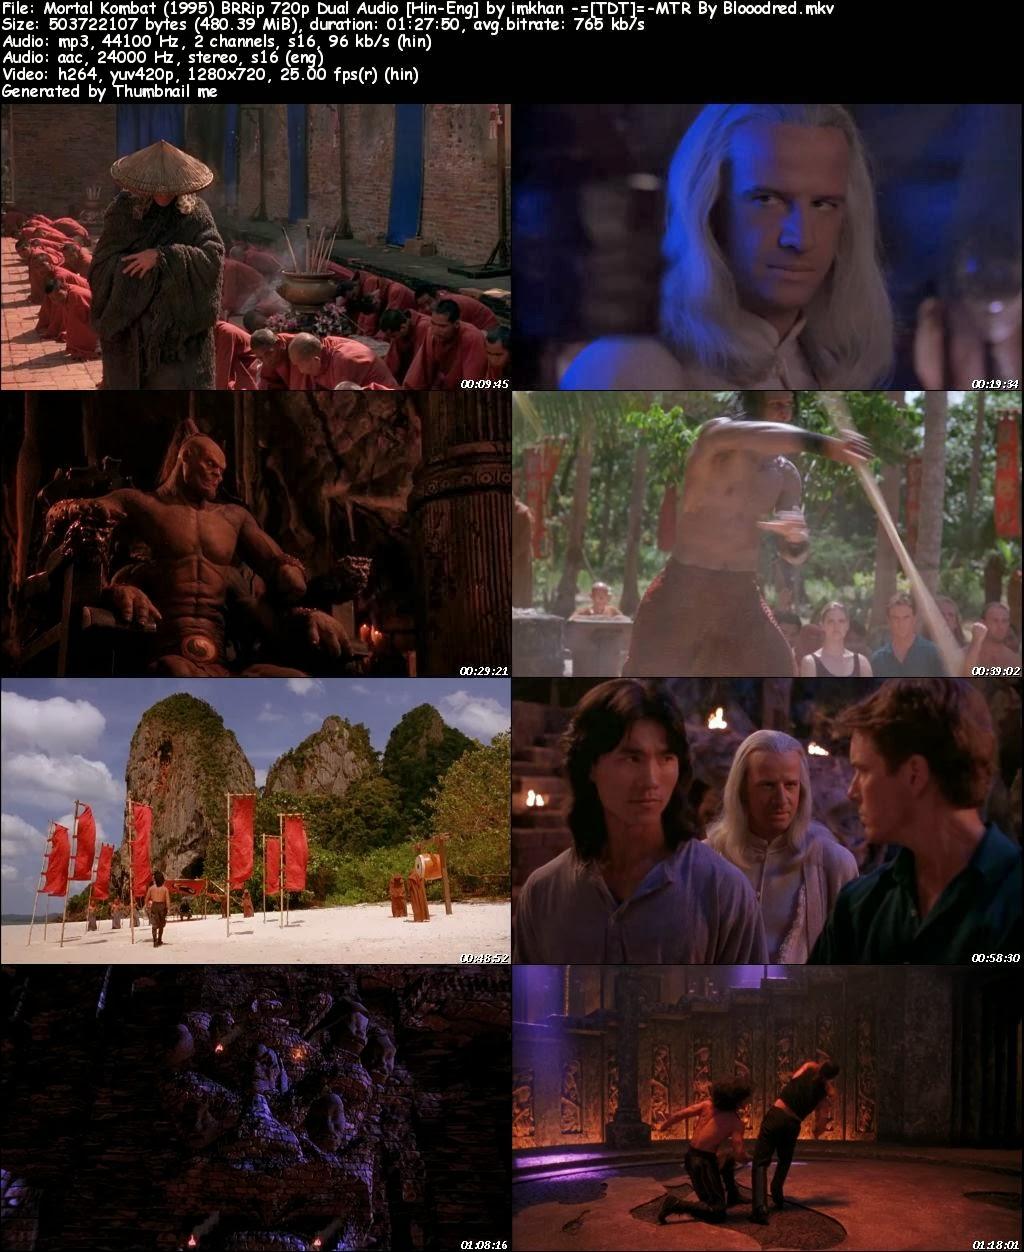 James Free World: Mortal Kombat (1995) BRRip 720p Dual